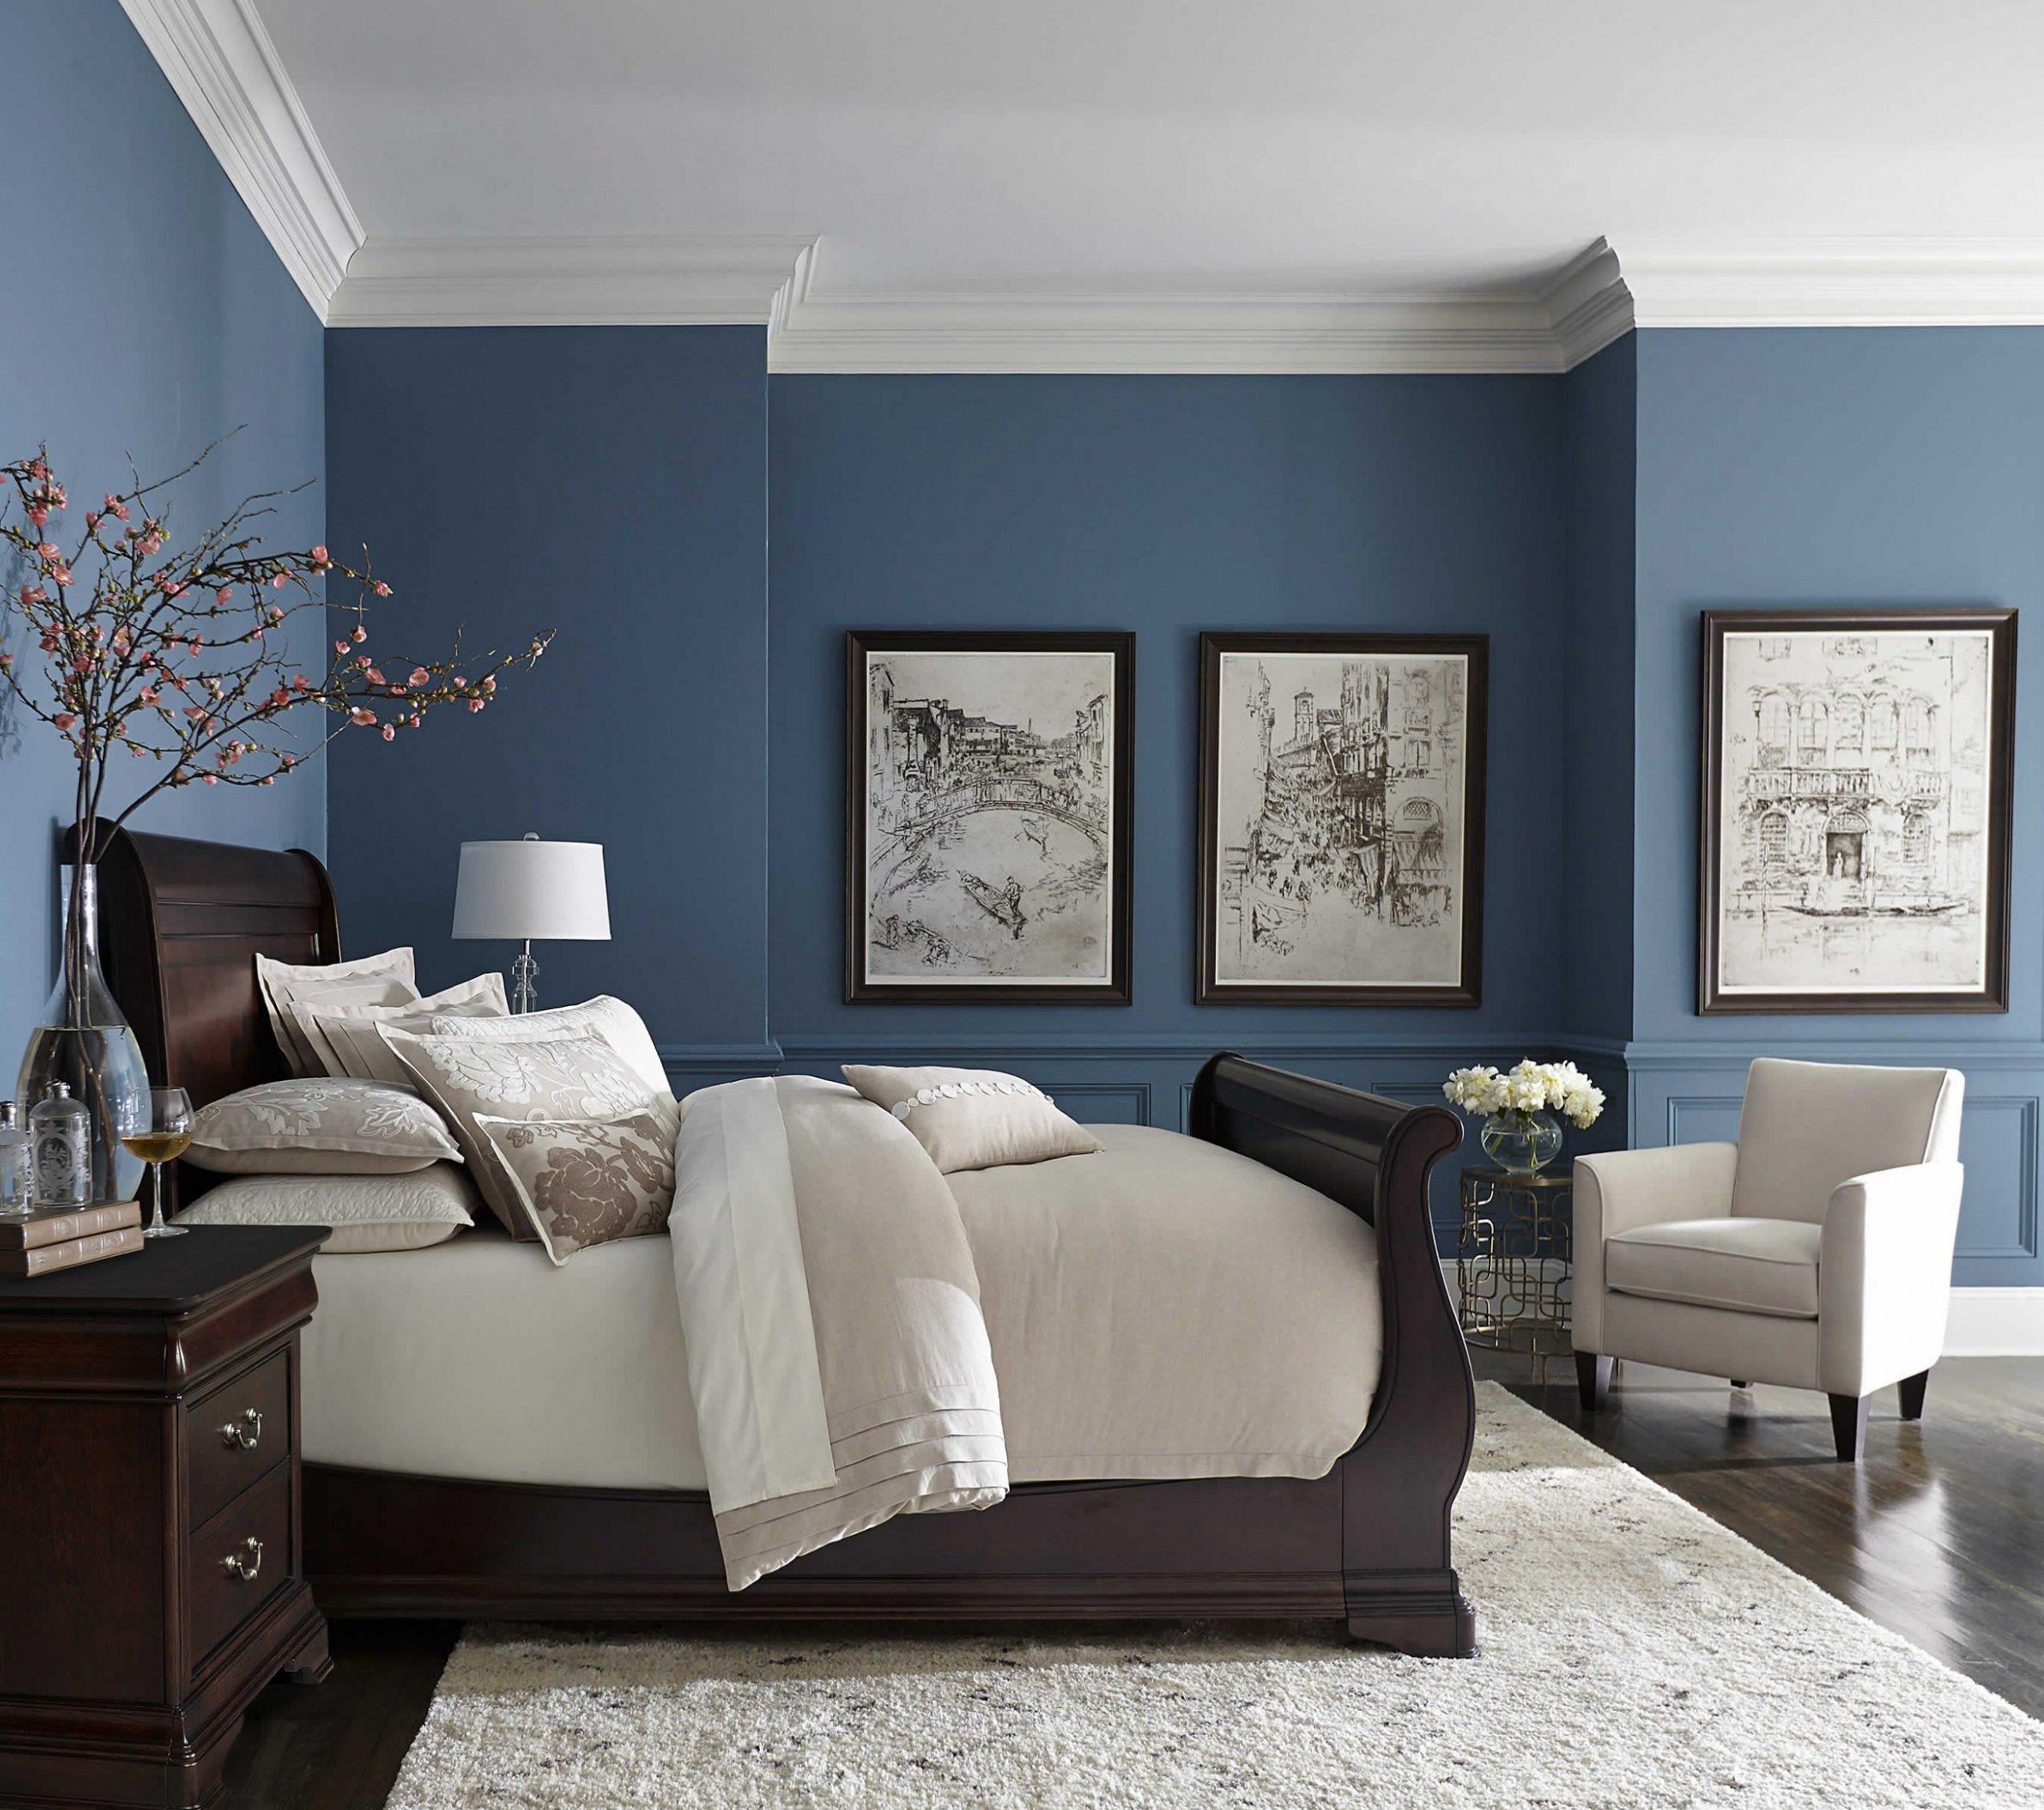 Effortlessly Elegant  Small master bedroom, Master bedrooms decor  - Bedroom Ideas Blue And Grey